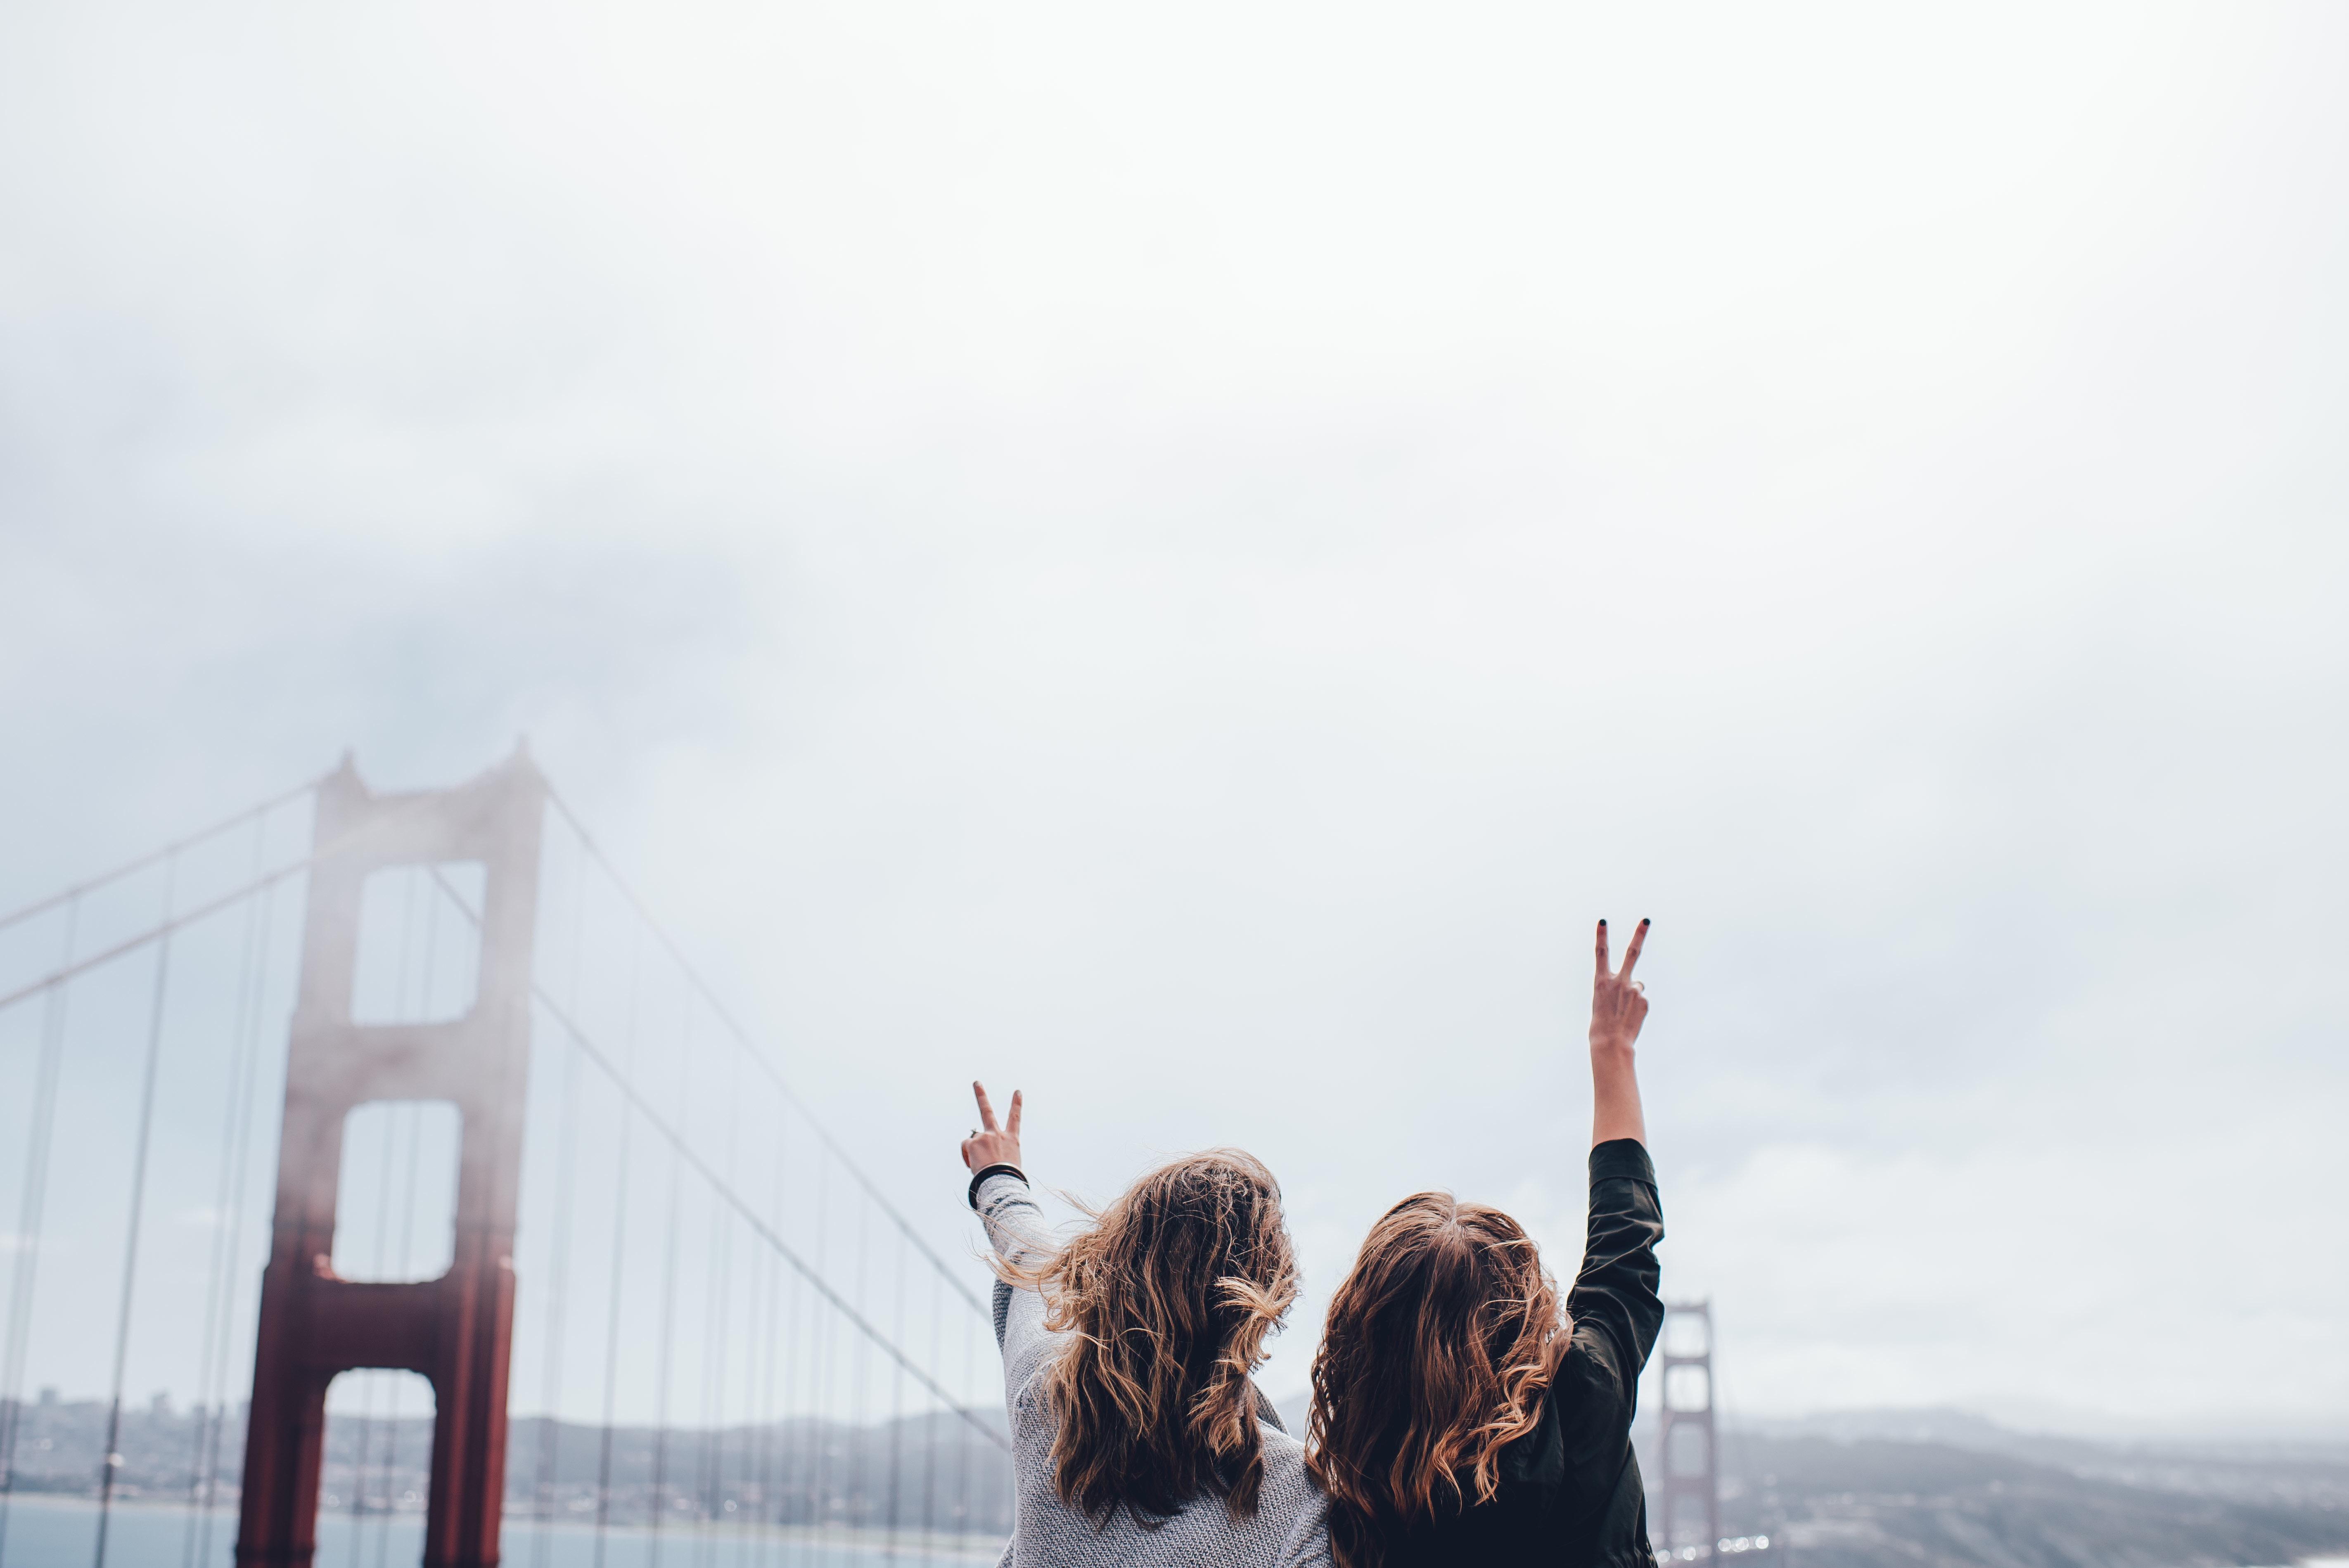 san fran bridge two girls peace sign jpeg